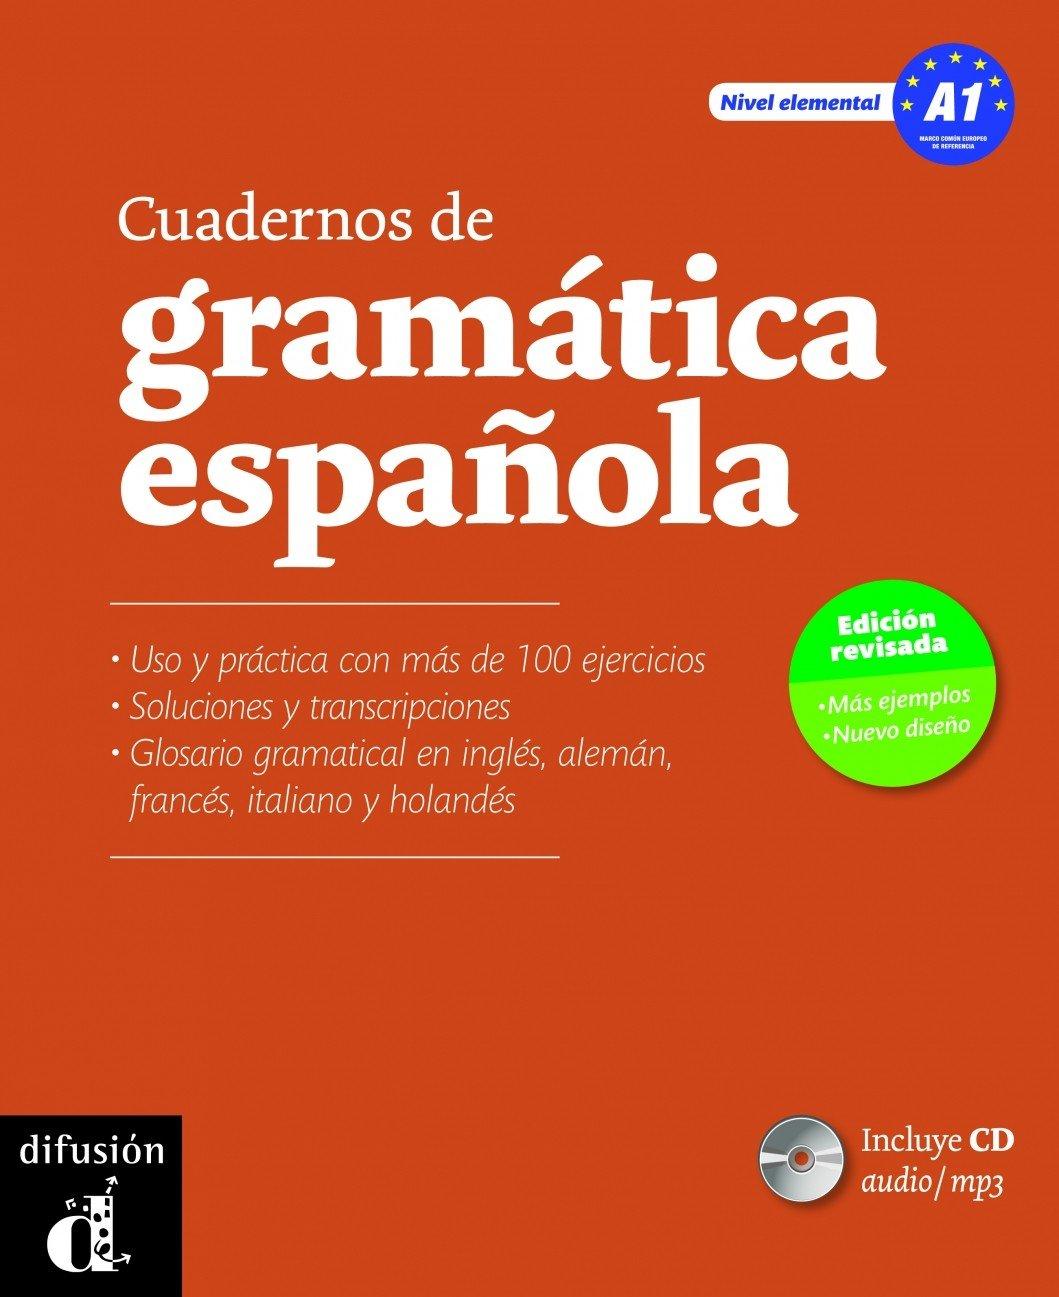 Cuadernos de gramatica espanola A1 + CD (Spanish Edition ...